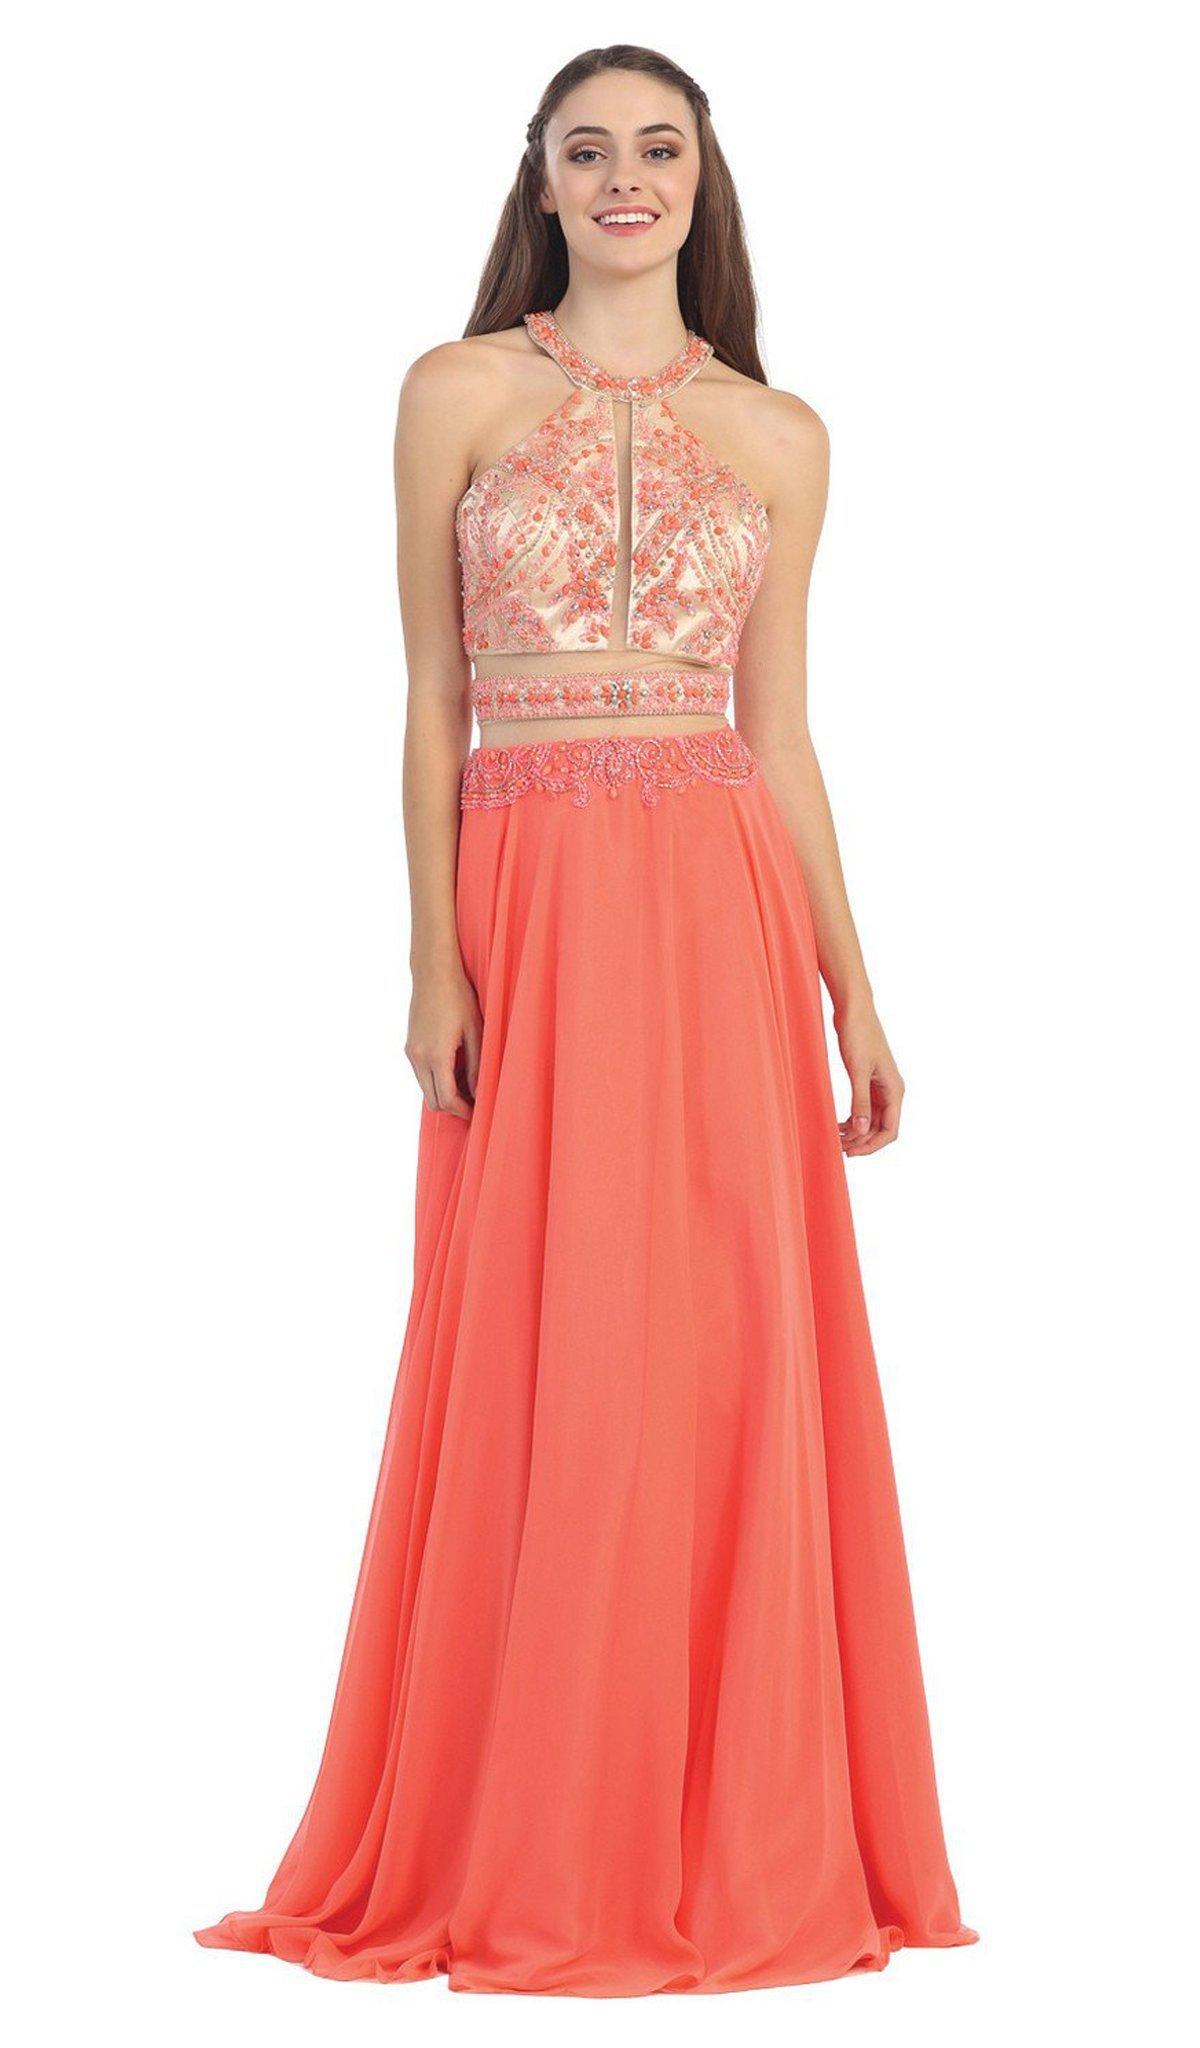 Eureka Fashion - 3888 Sleeveless Beaded Halter Chiffon A-line Dress